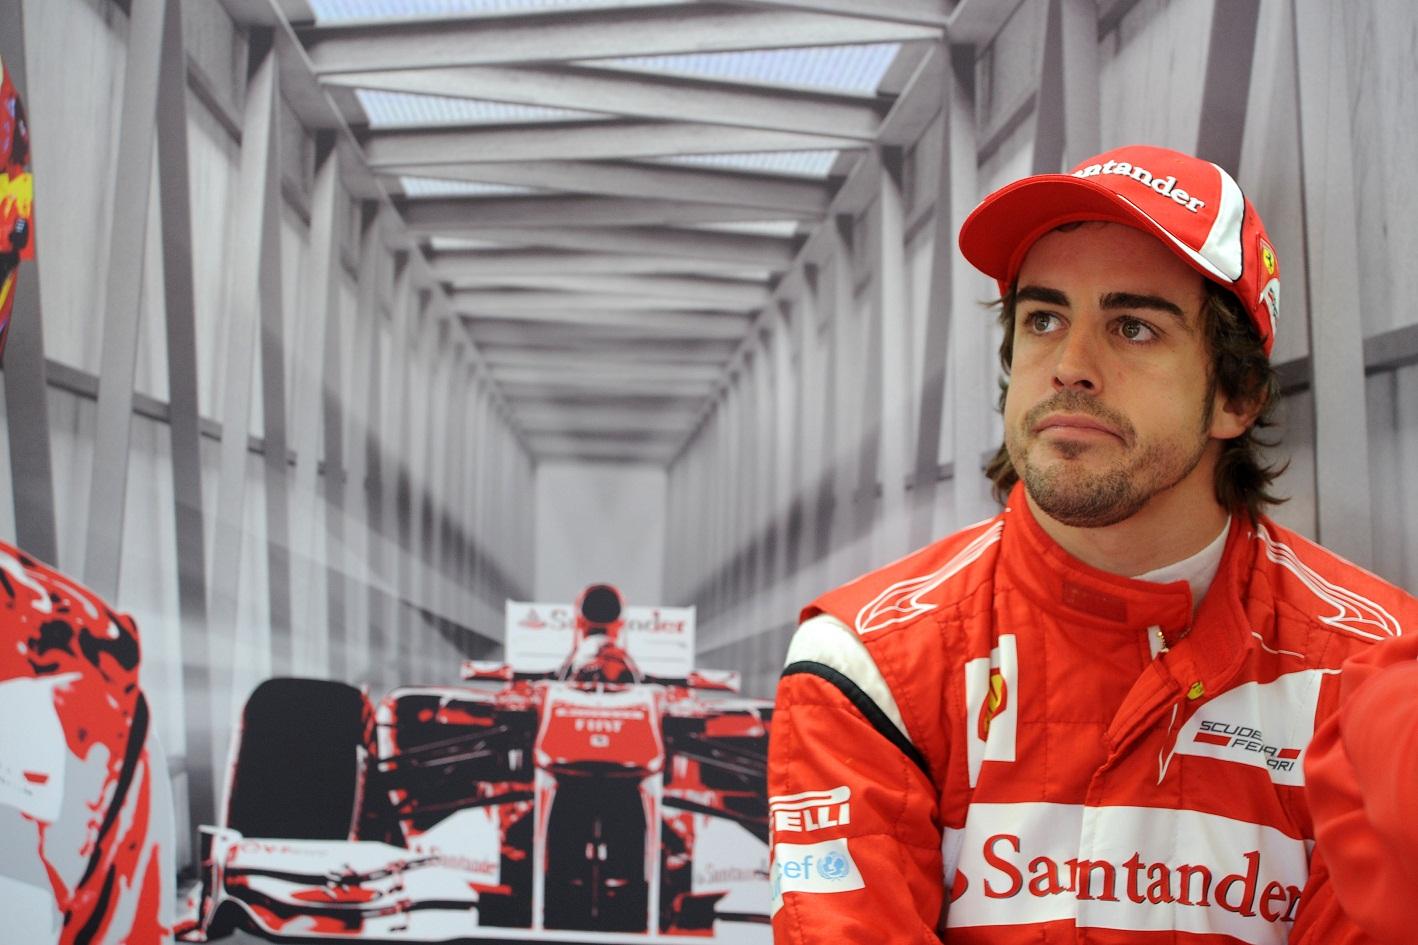 Piloto español Fernando Alonso anunció su retiro de la Fórmula 1